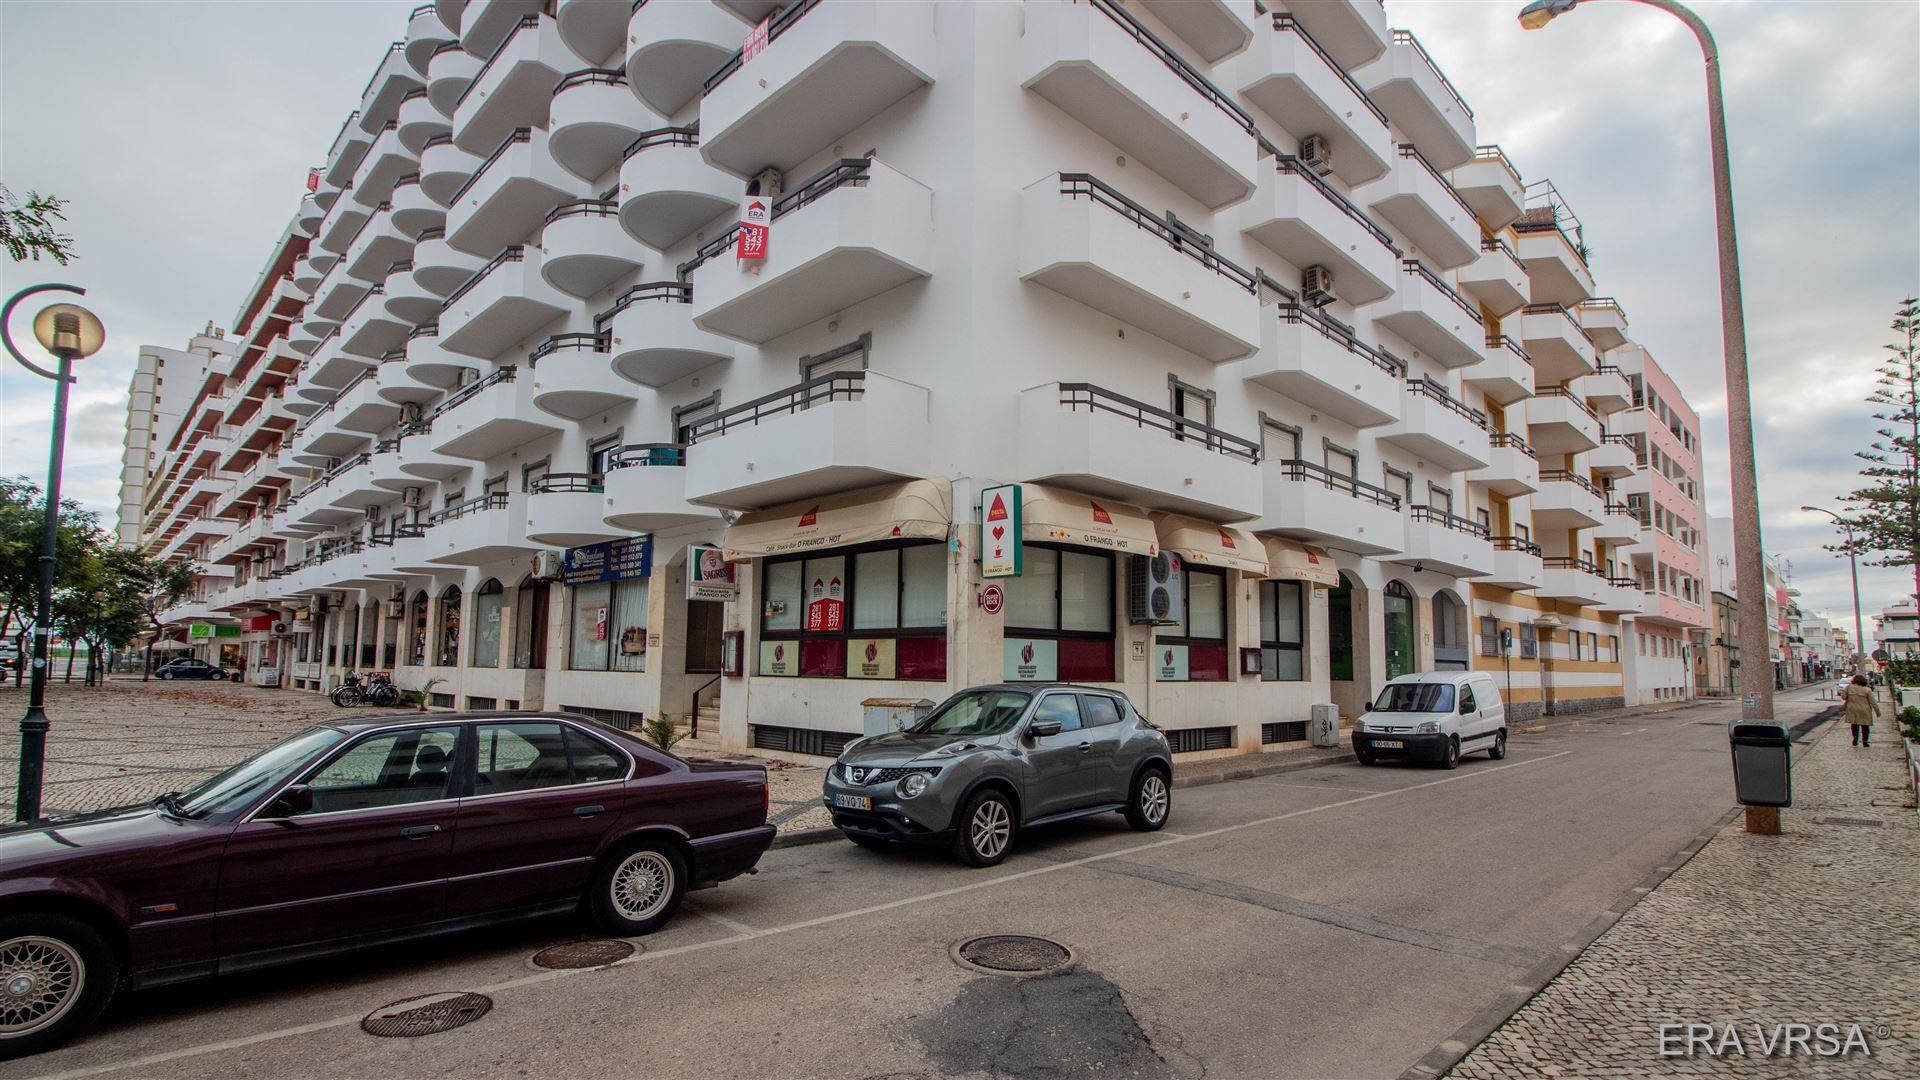 Garagem para comprar - Algarve, Monte Gordo, Vila Real de Santo António